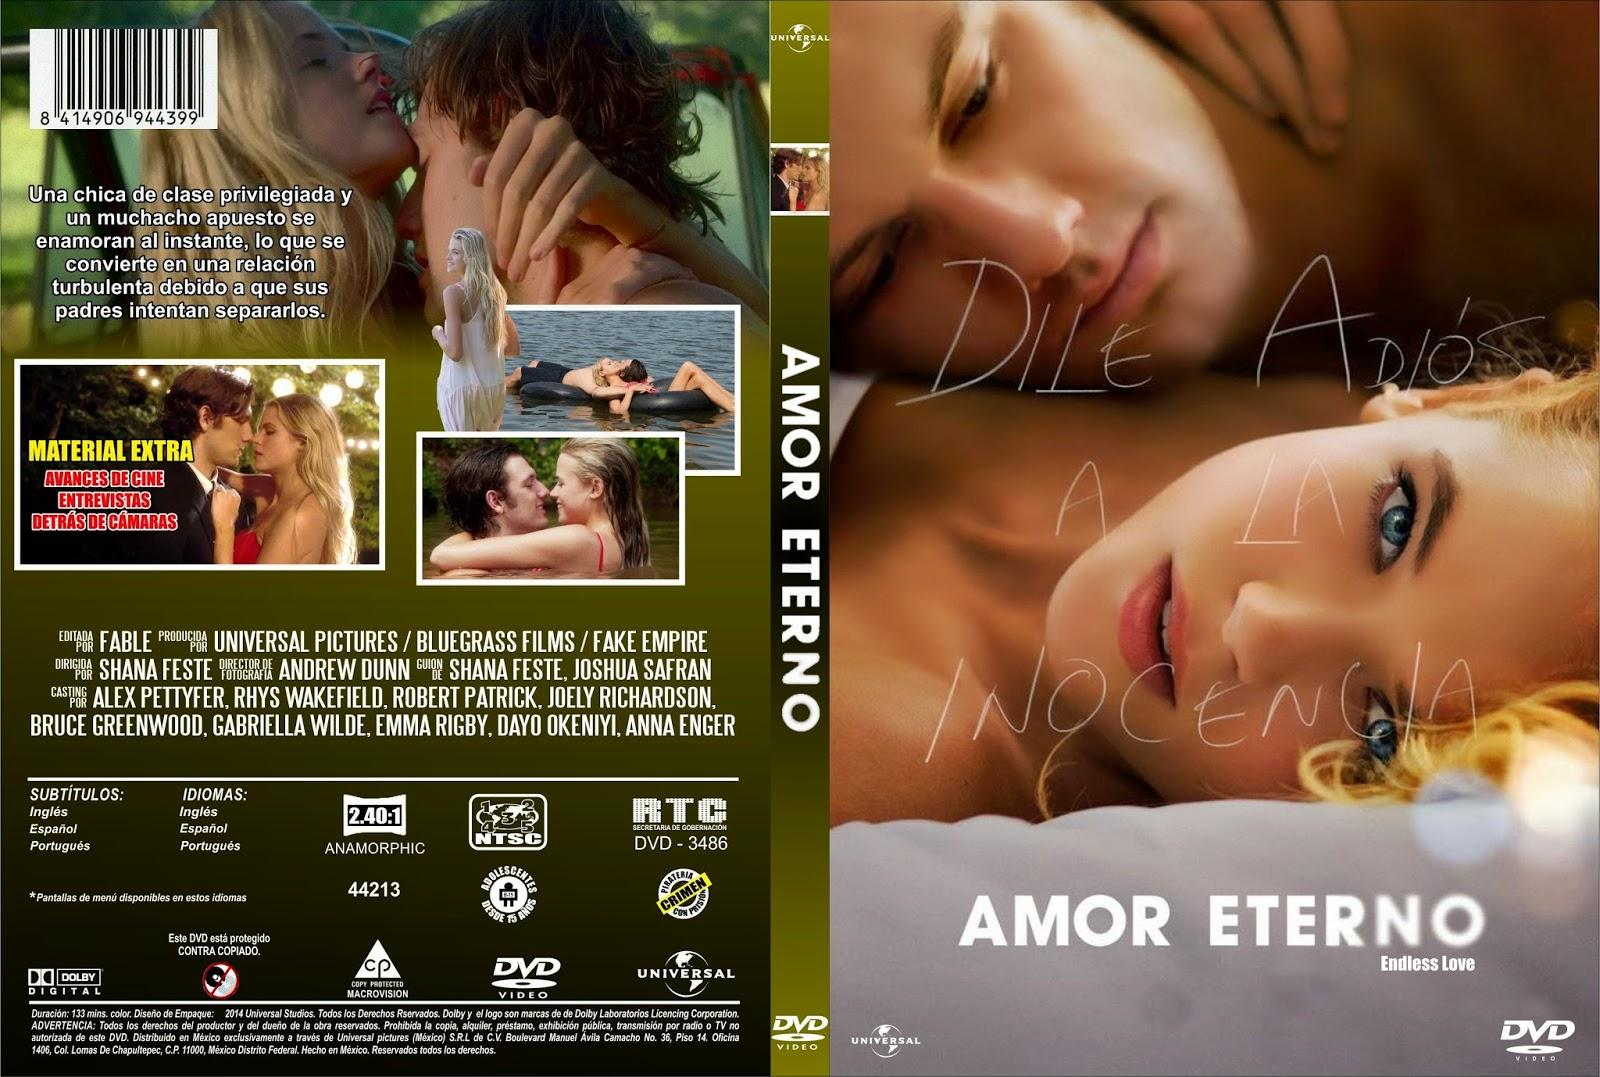 Endless Love Amor Eterno Dvdfull Latino Solodvdfulllatinocl